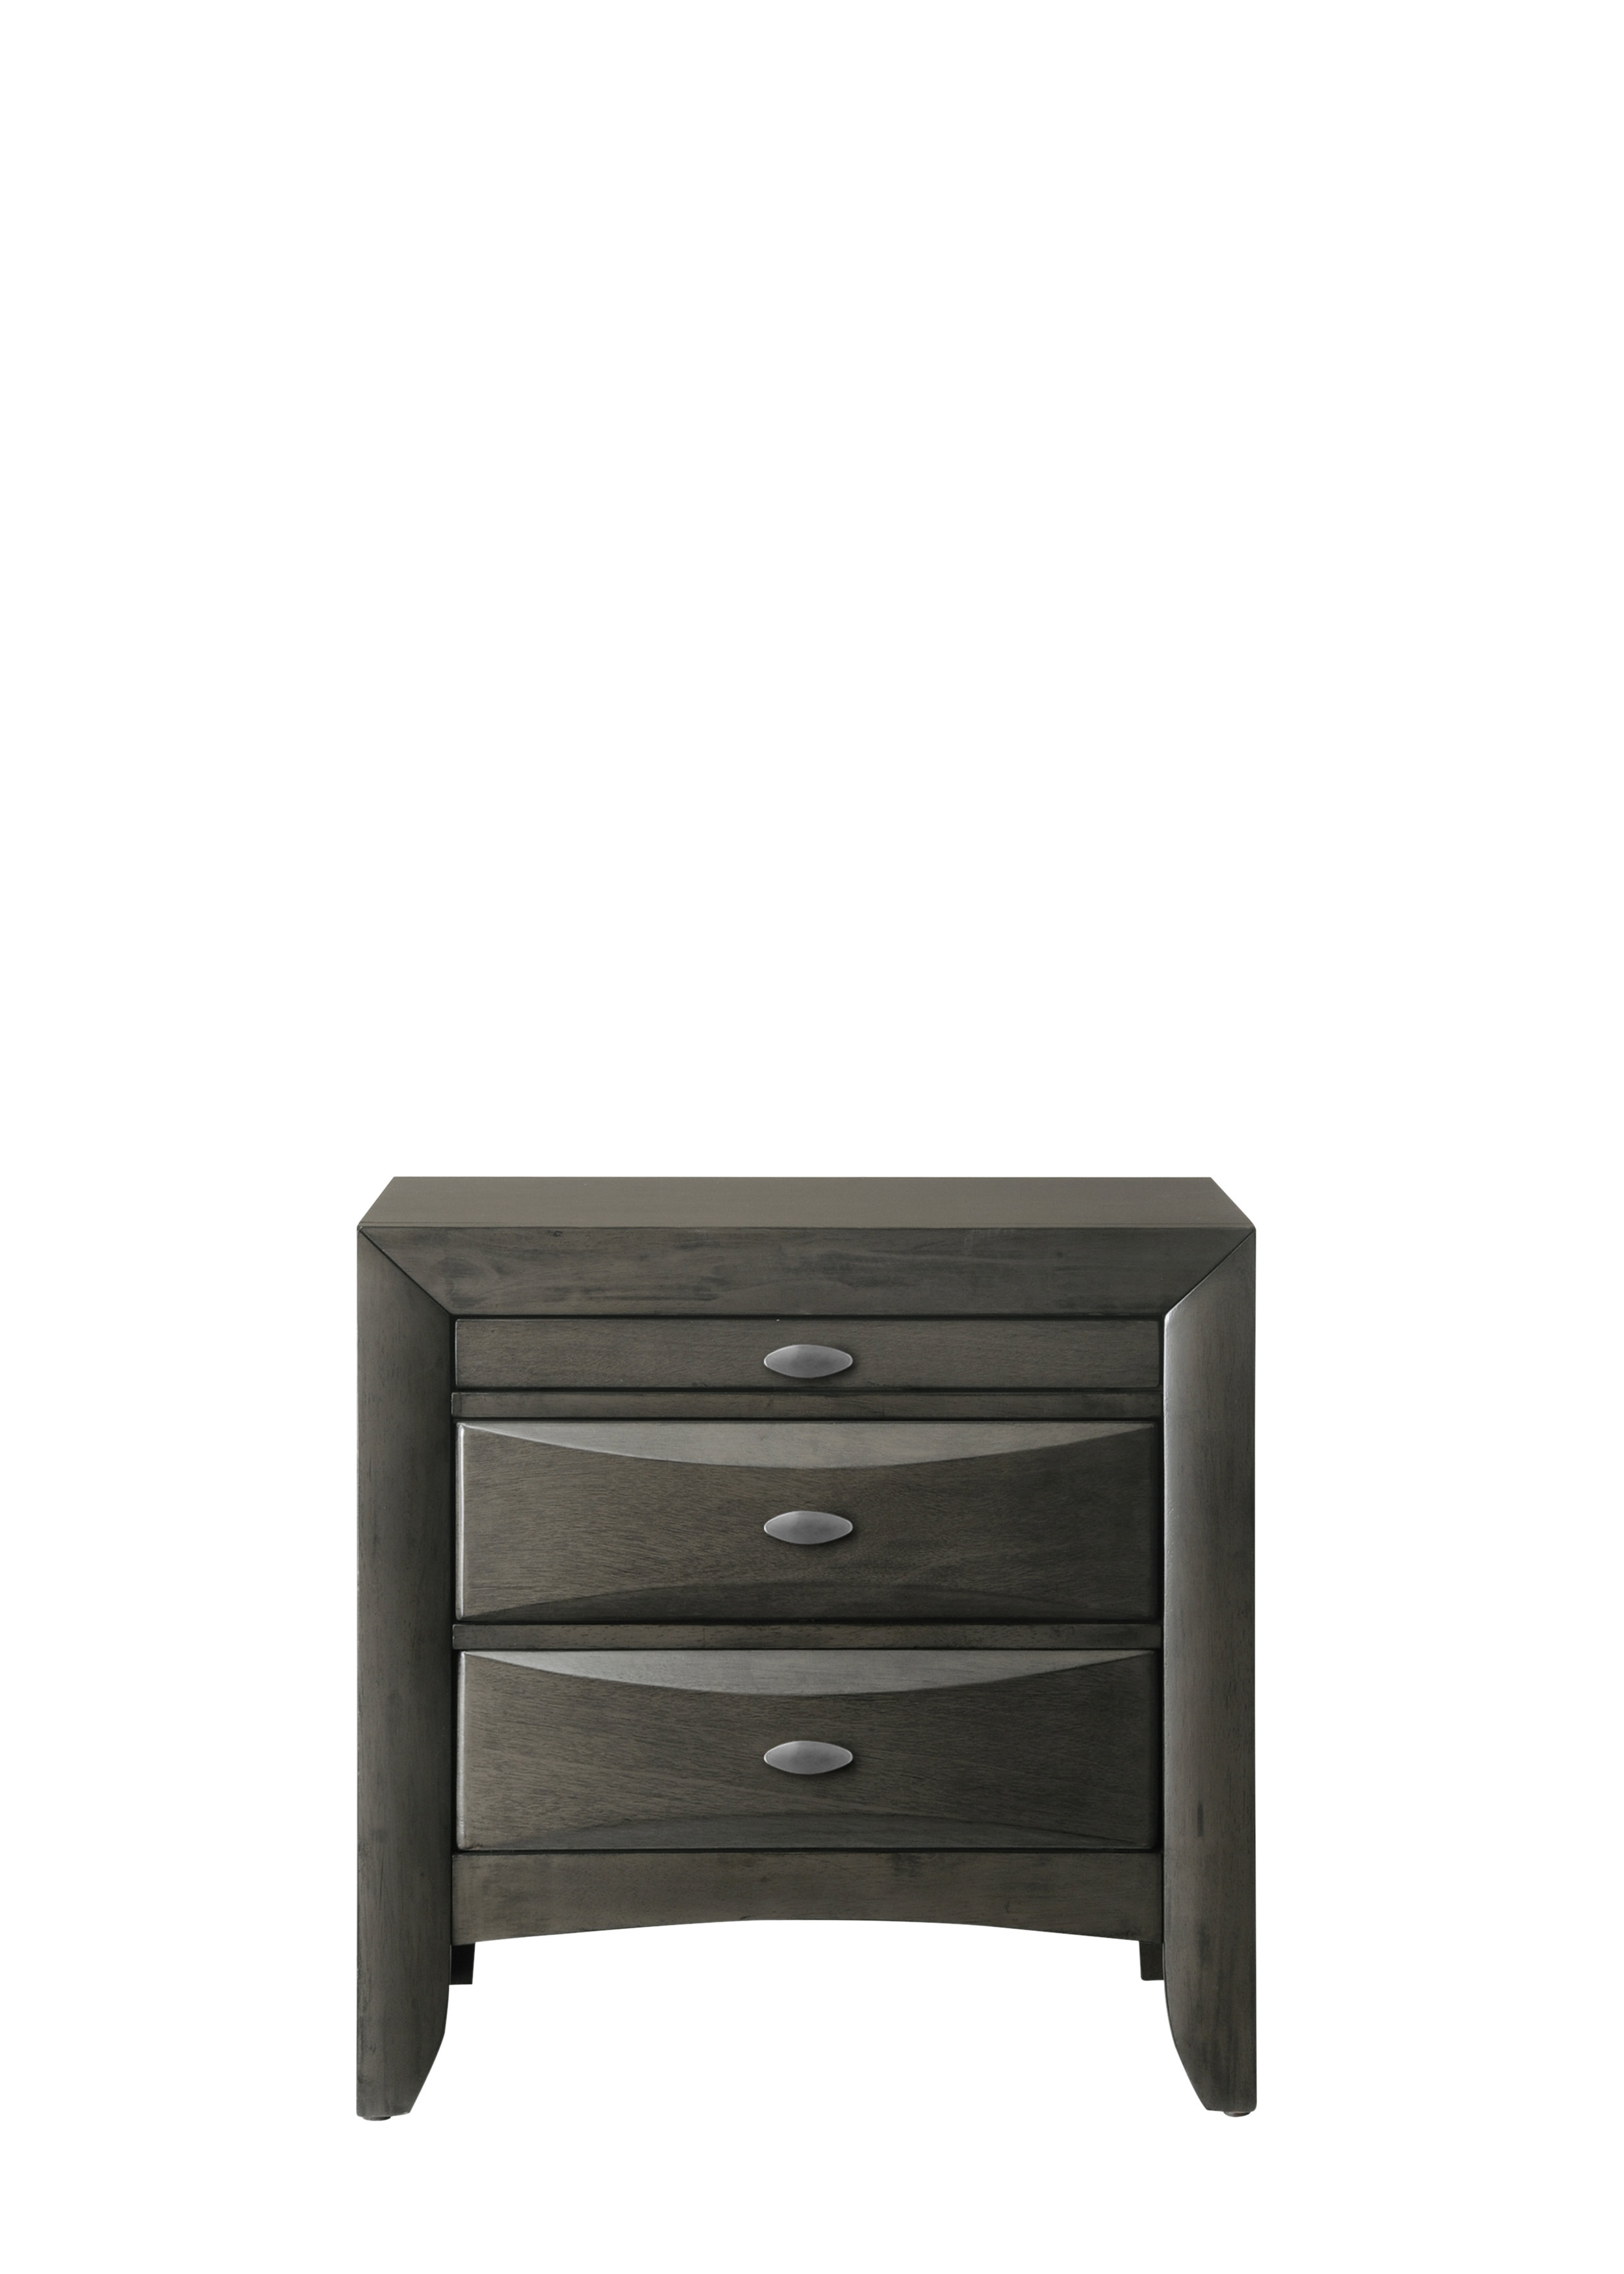 Ultimate Storage Grey Factory Direct Furniture Store America The Beautiful Dreamer